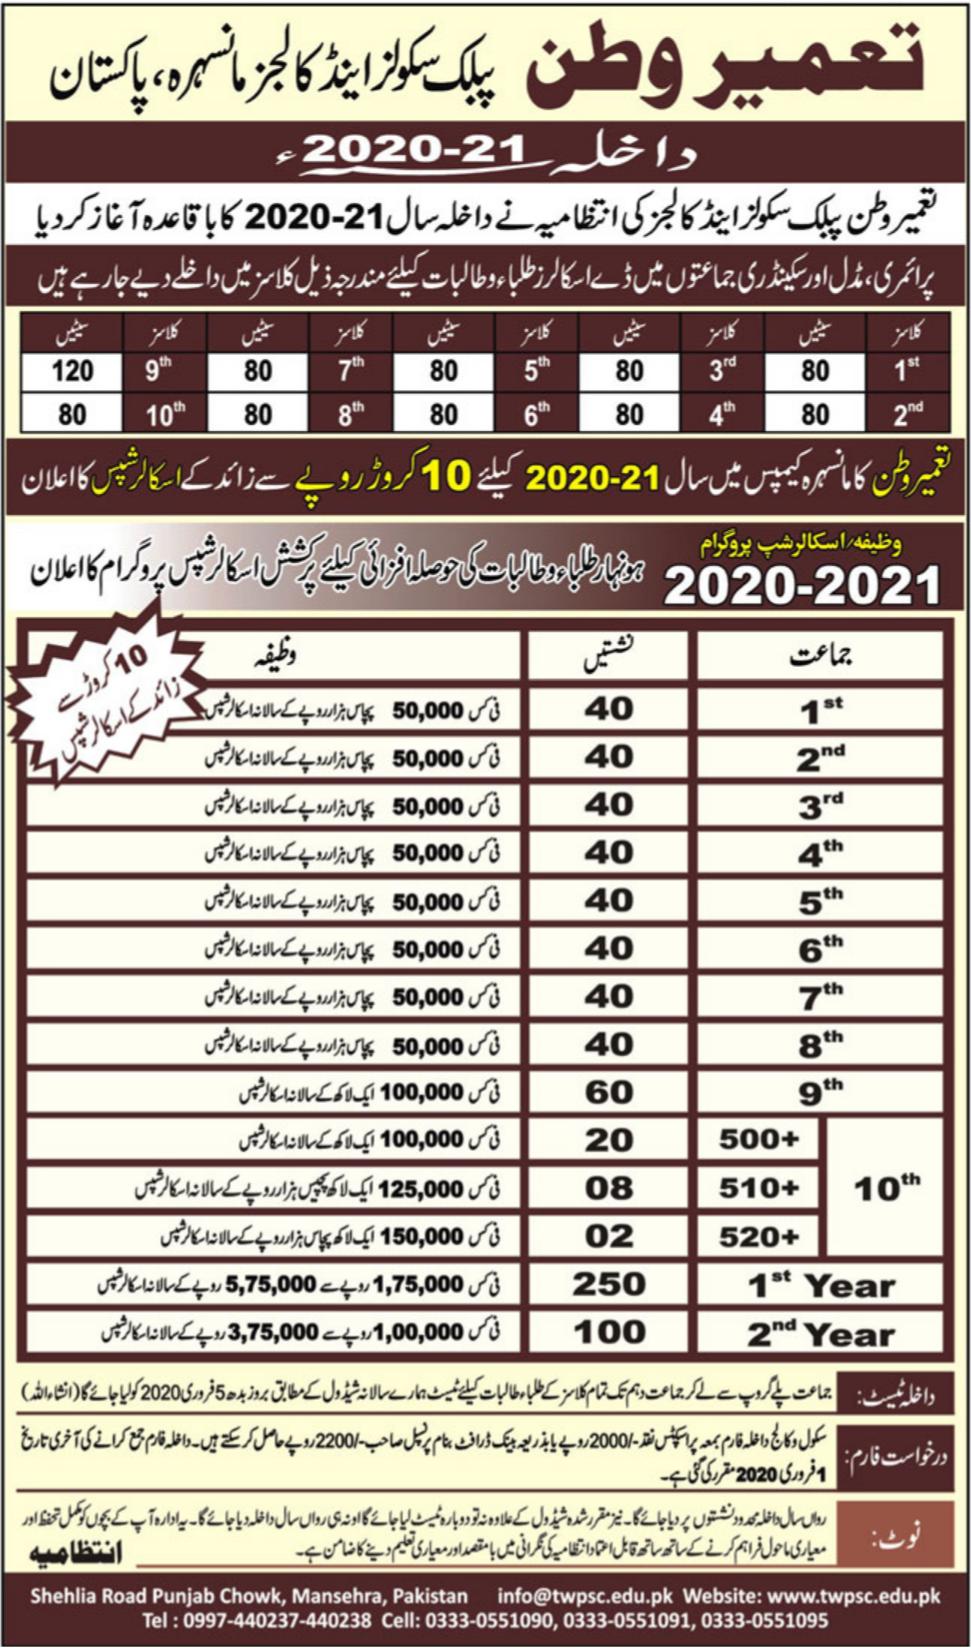 Tameer Watan Public School & College Admission 2020-2021